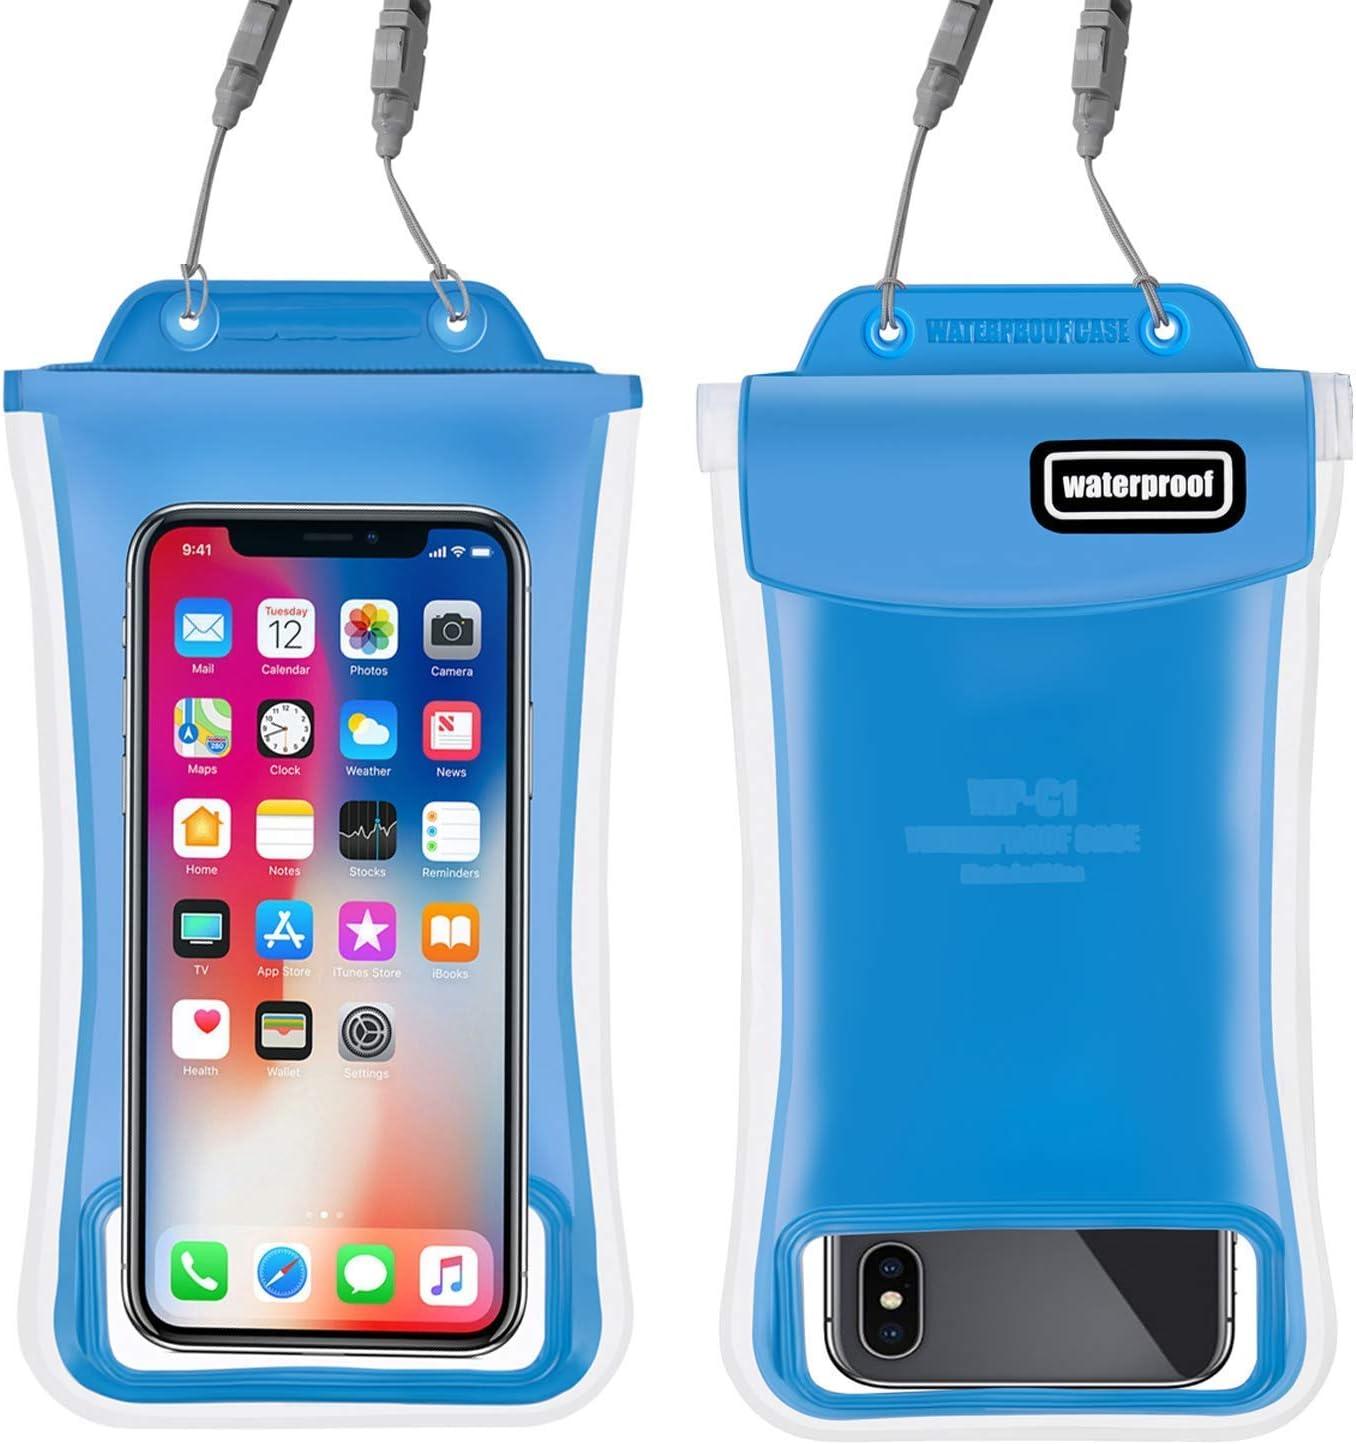 Tactix Water Resistant waterproof drybox Case Small size cel phone wallet keys